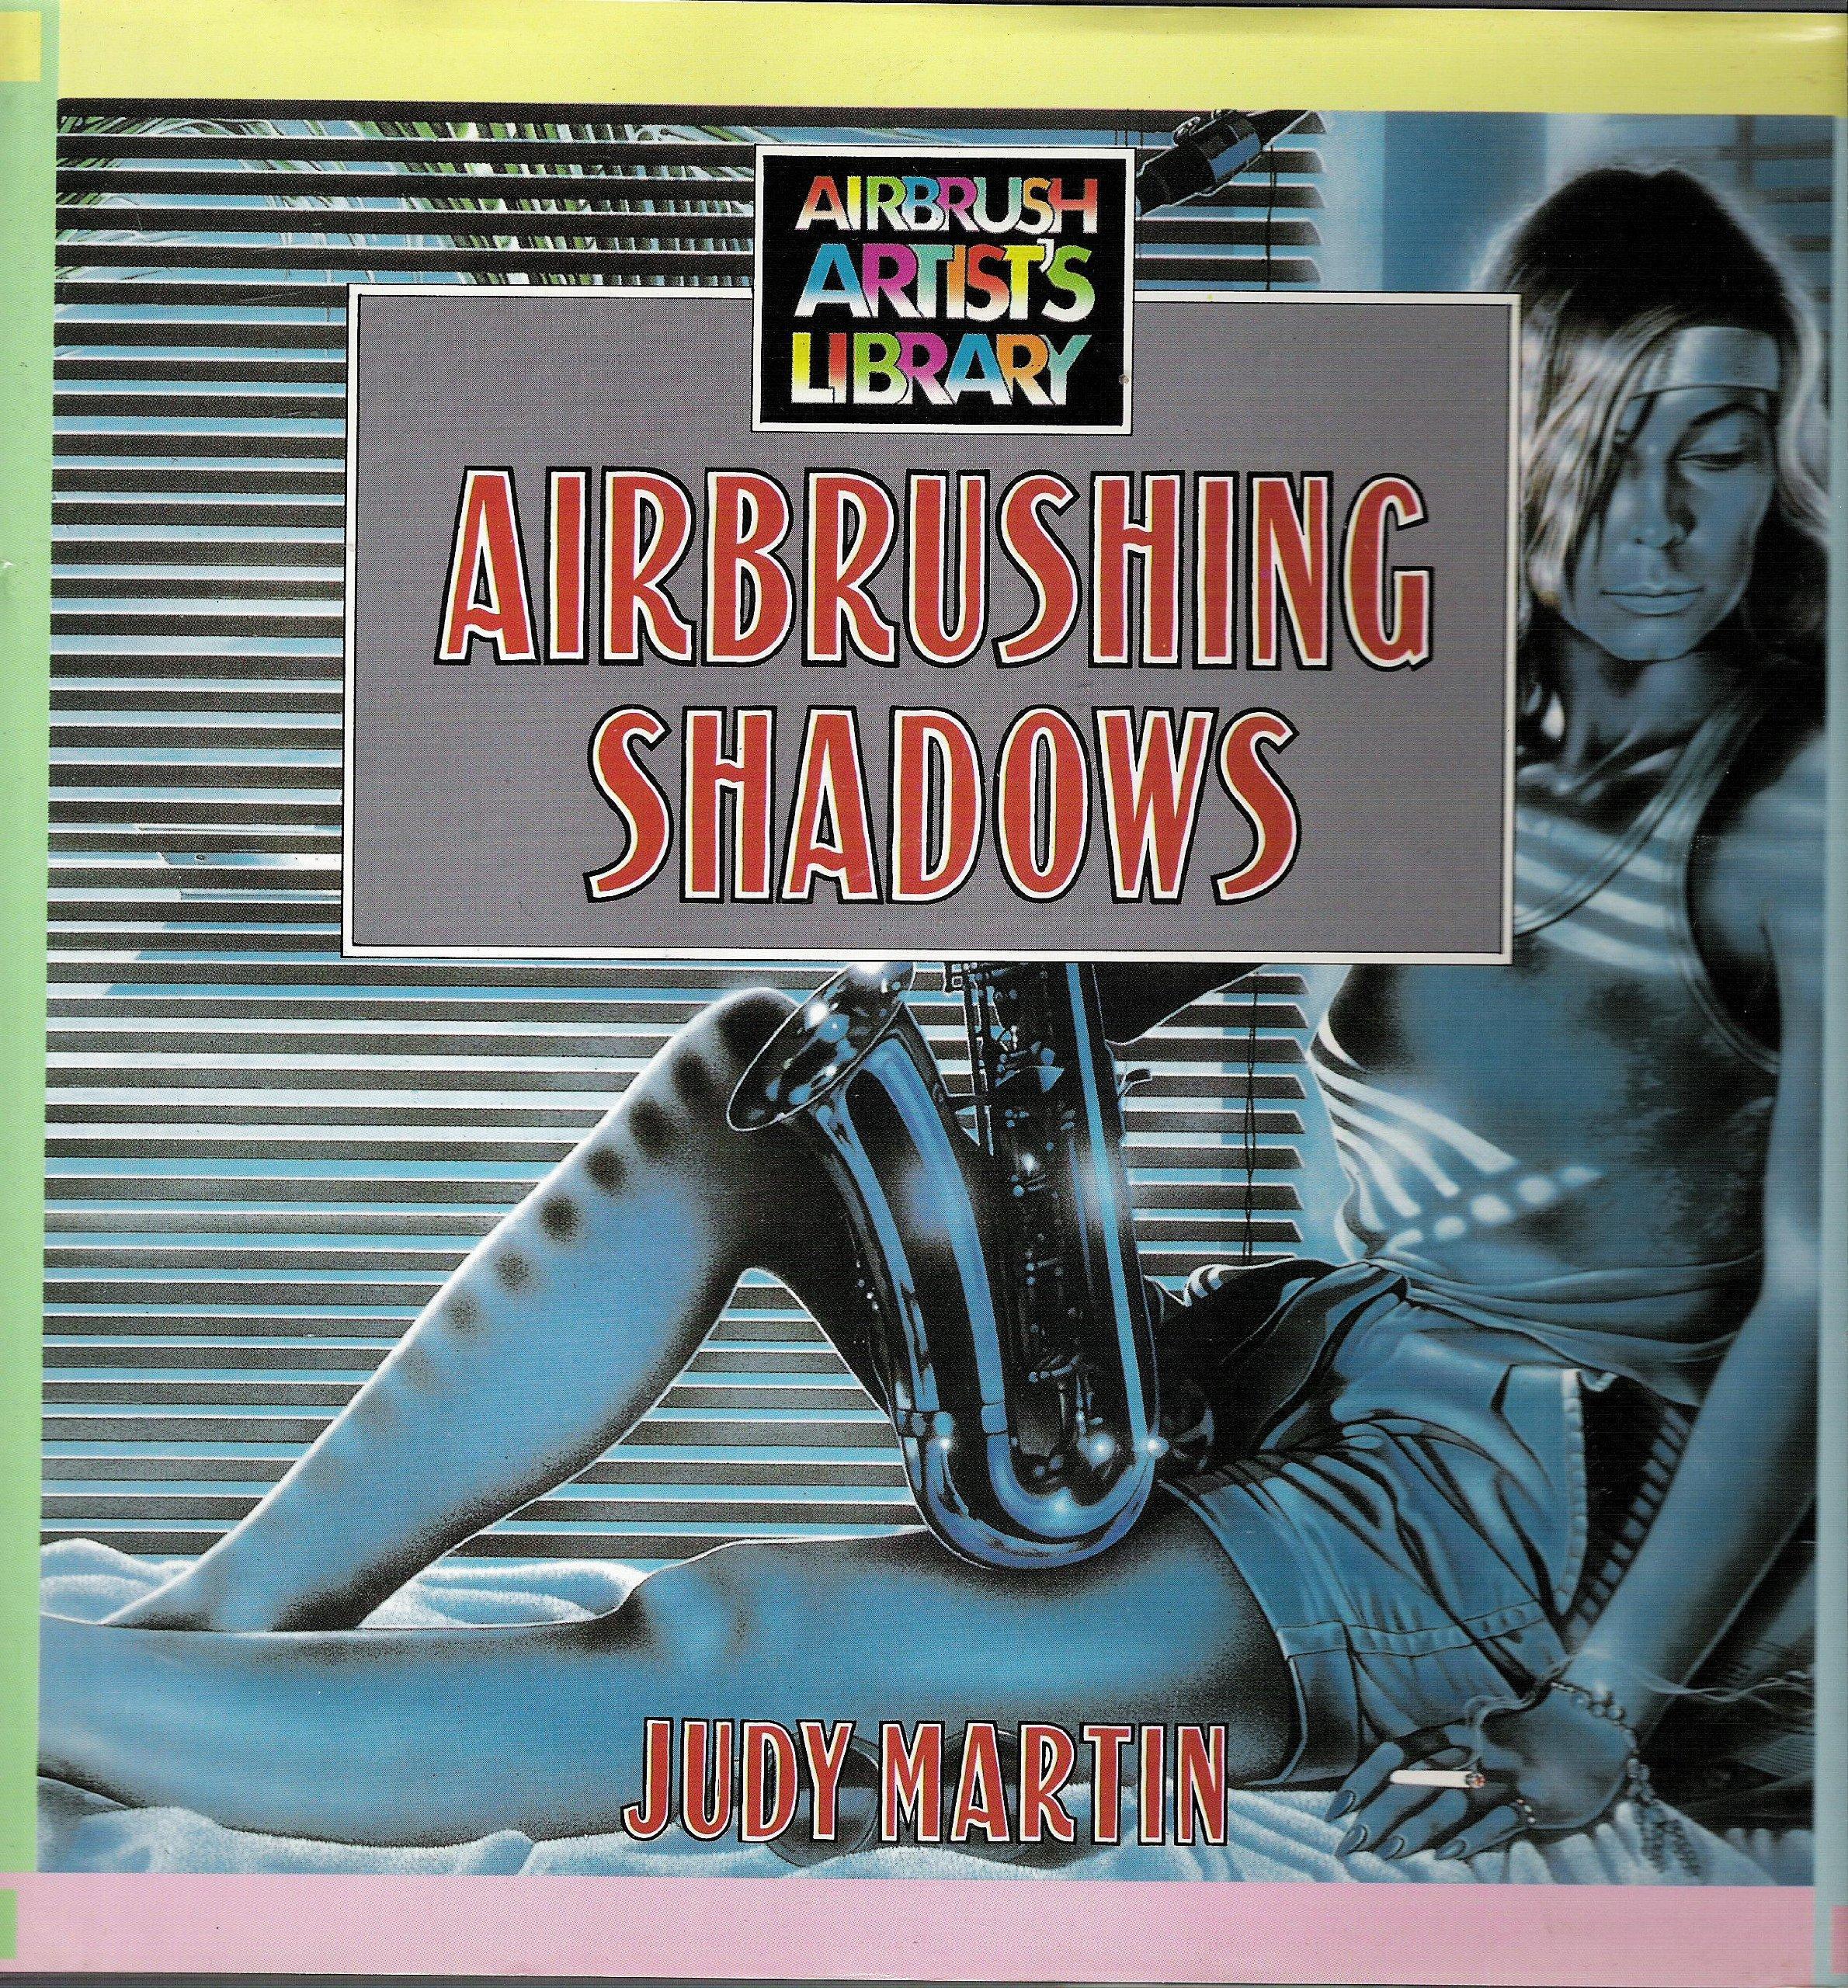 airbrushing shadows airbrush artists library